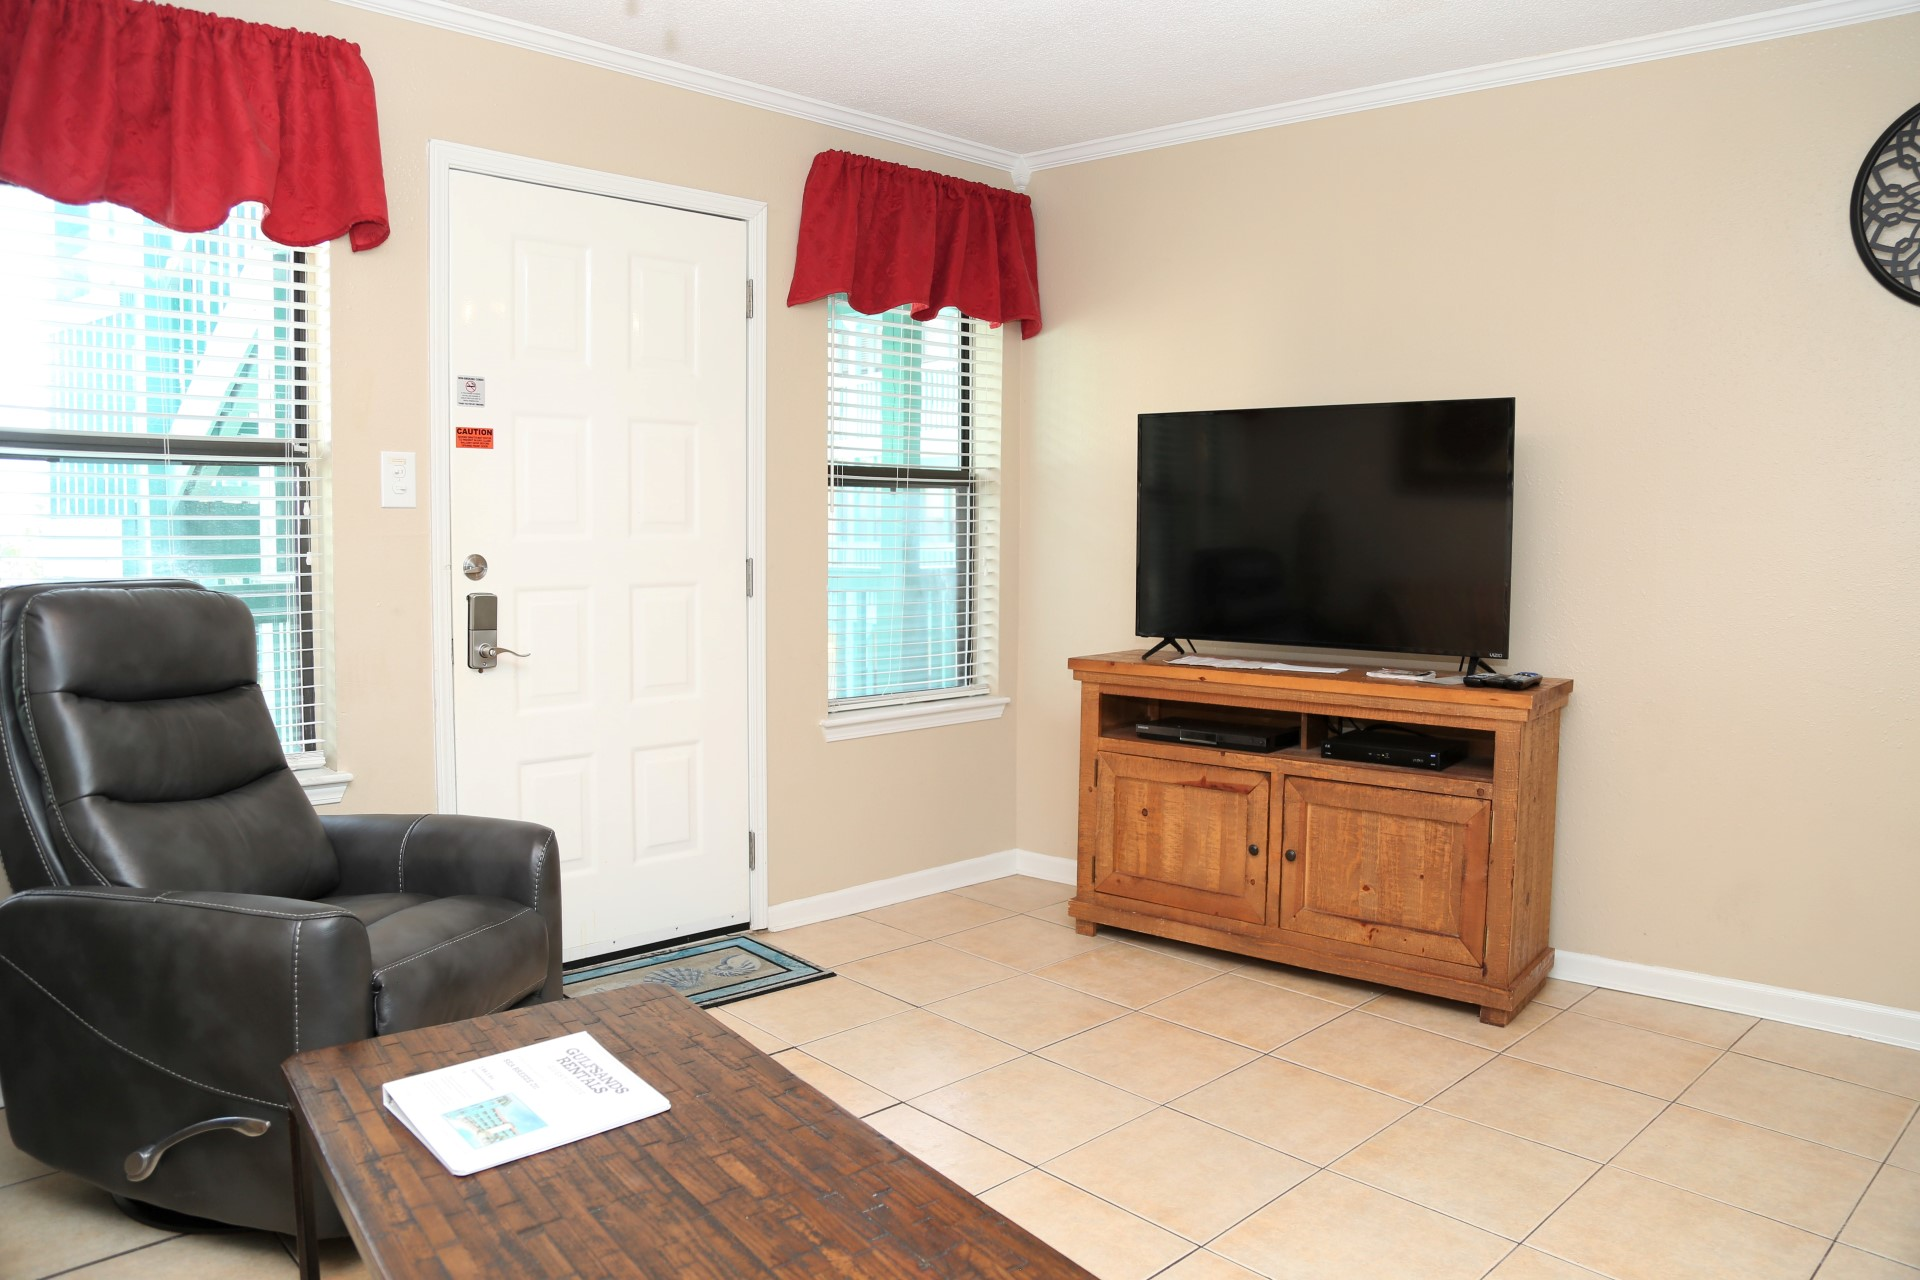 50 inch SMART TV in Living Area